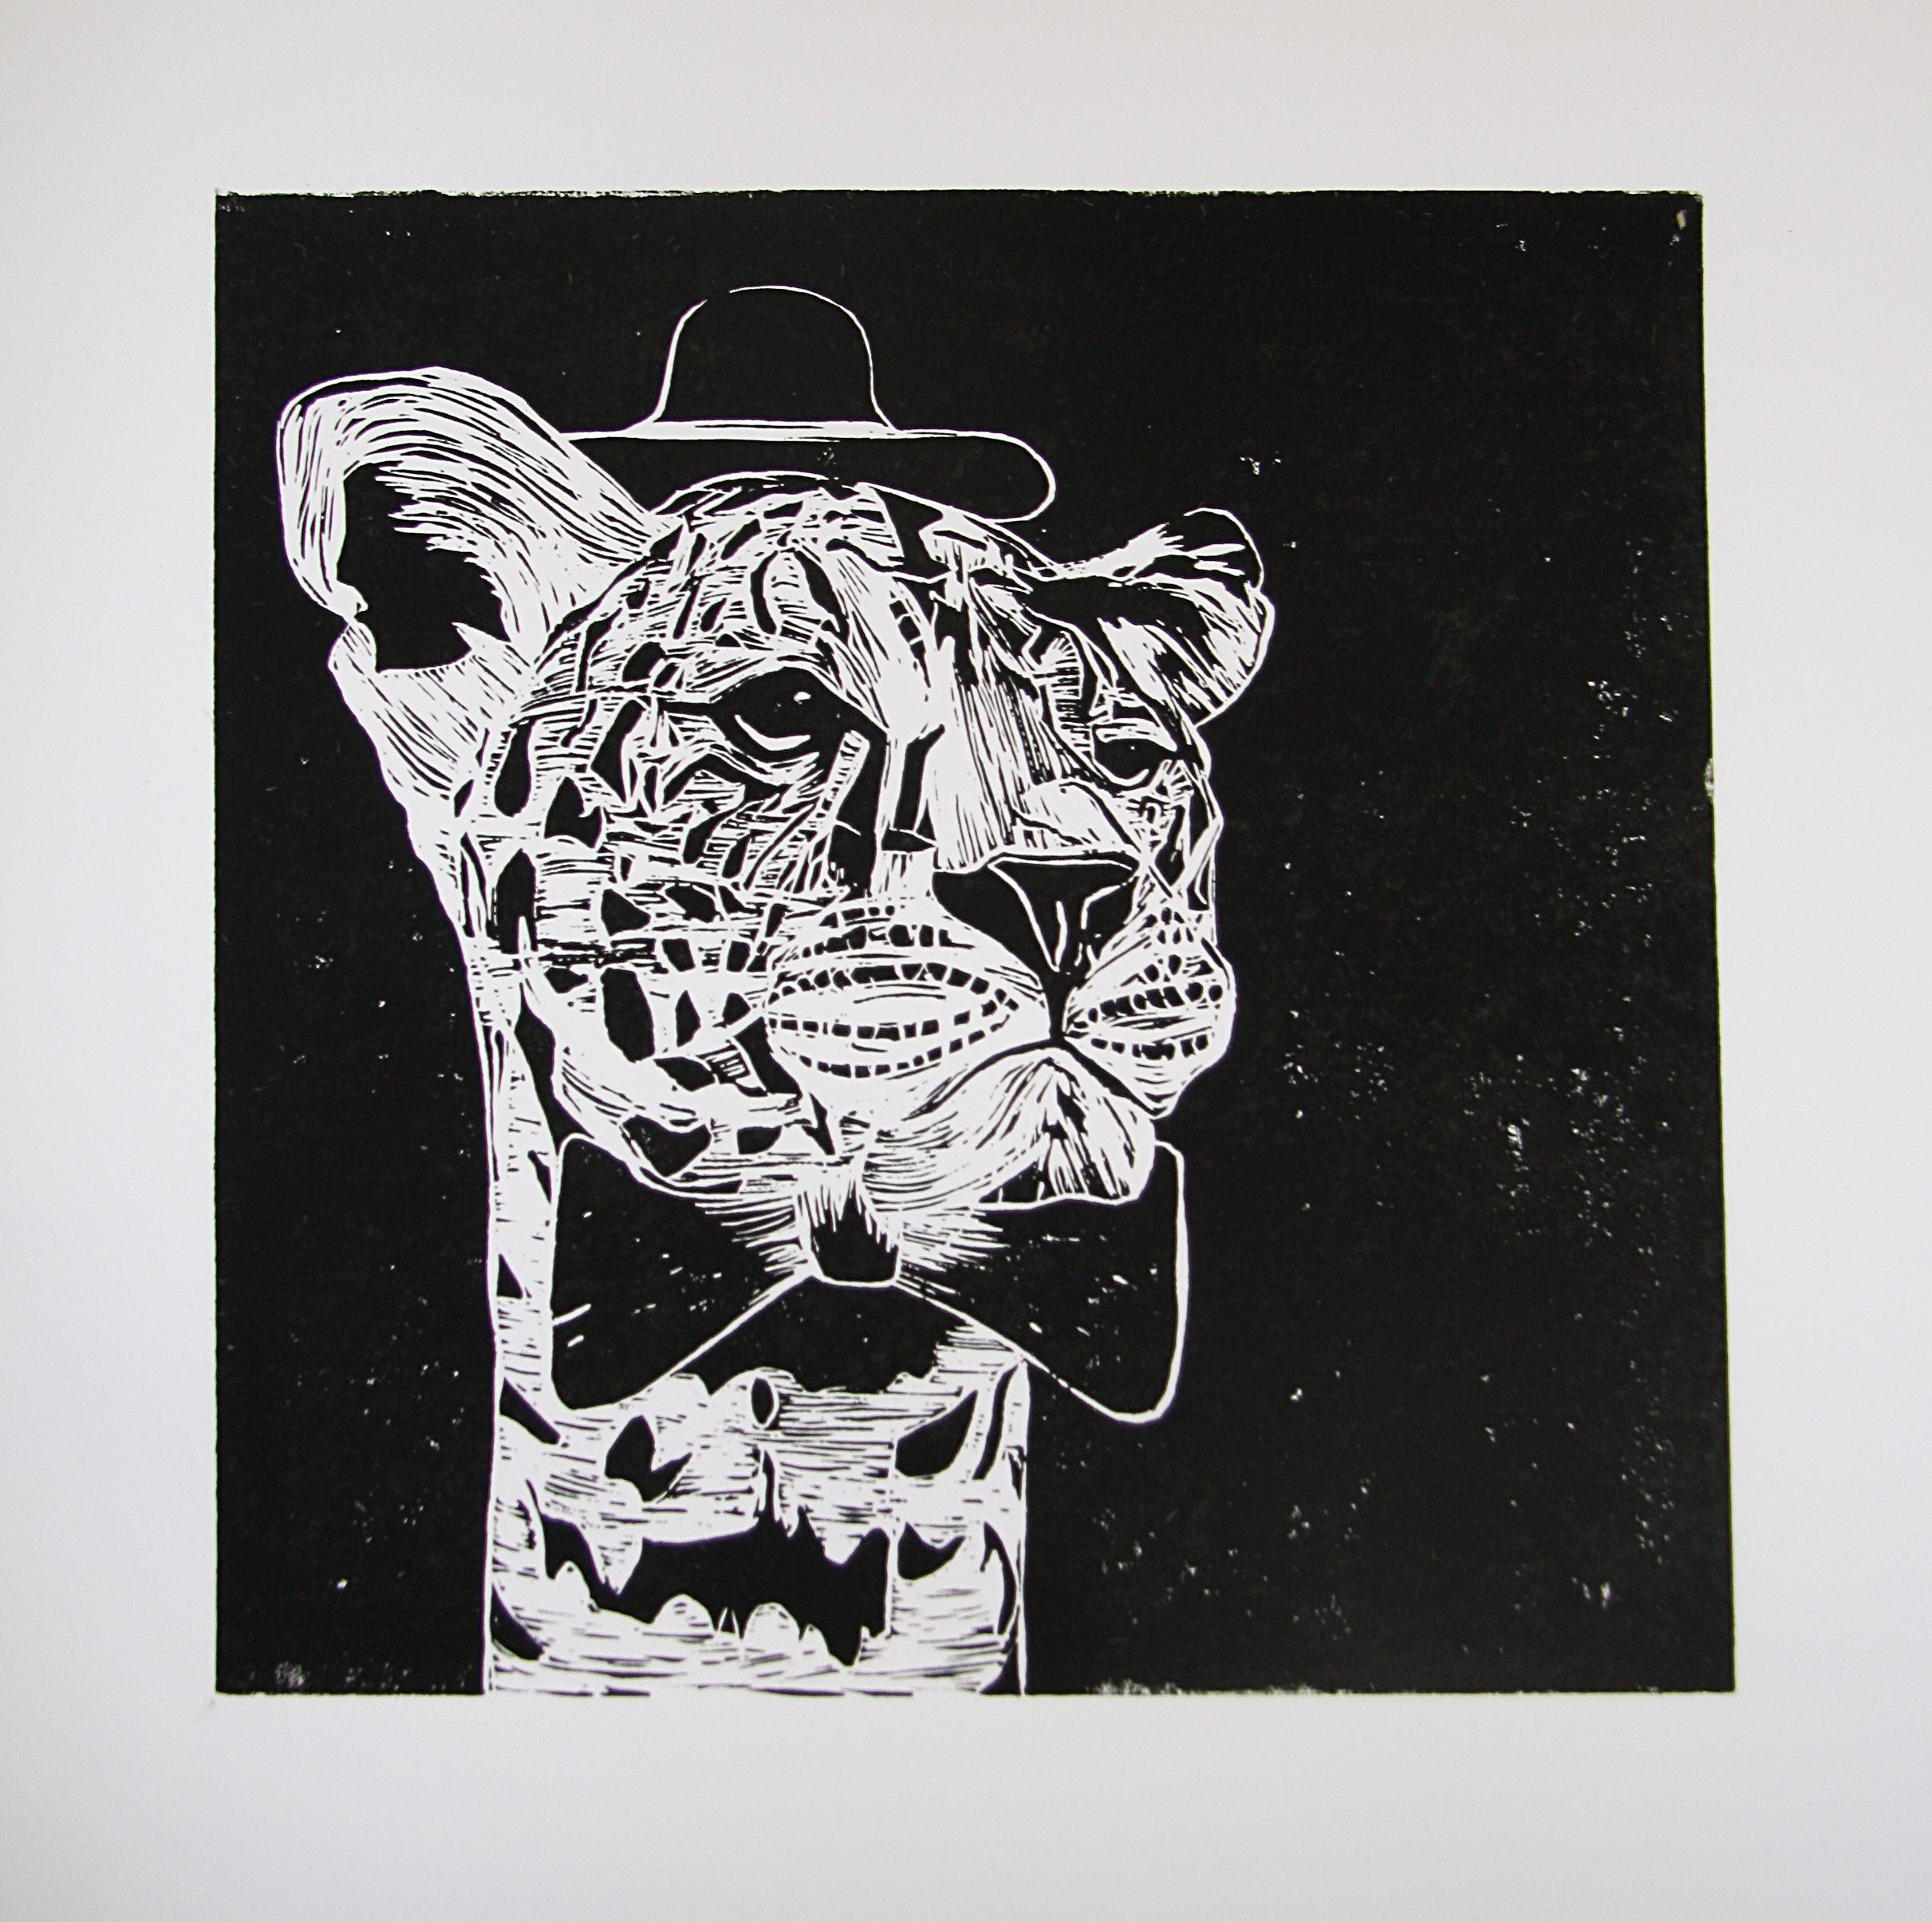 'Mr. Leopard', linocut on paper, 42cm x 59.4cm, 2016